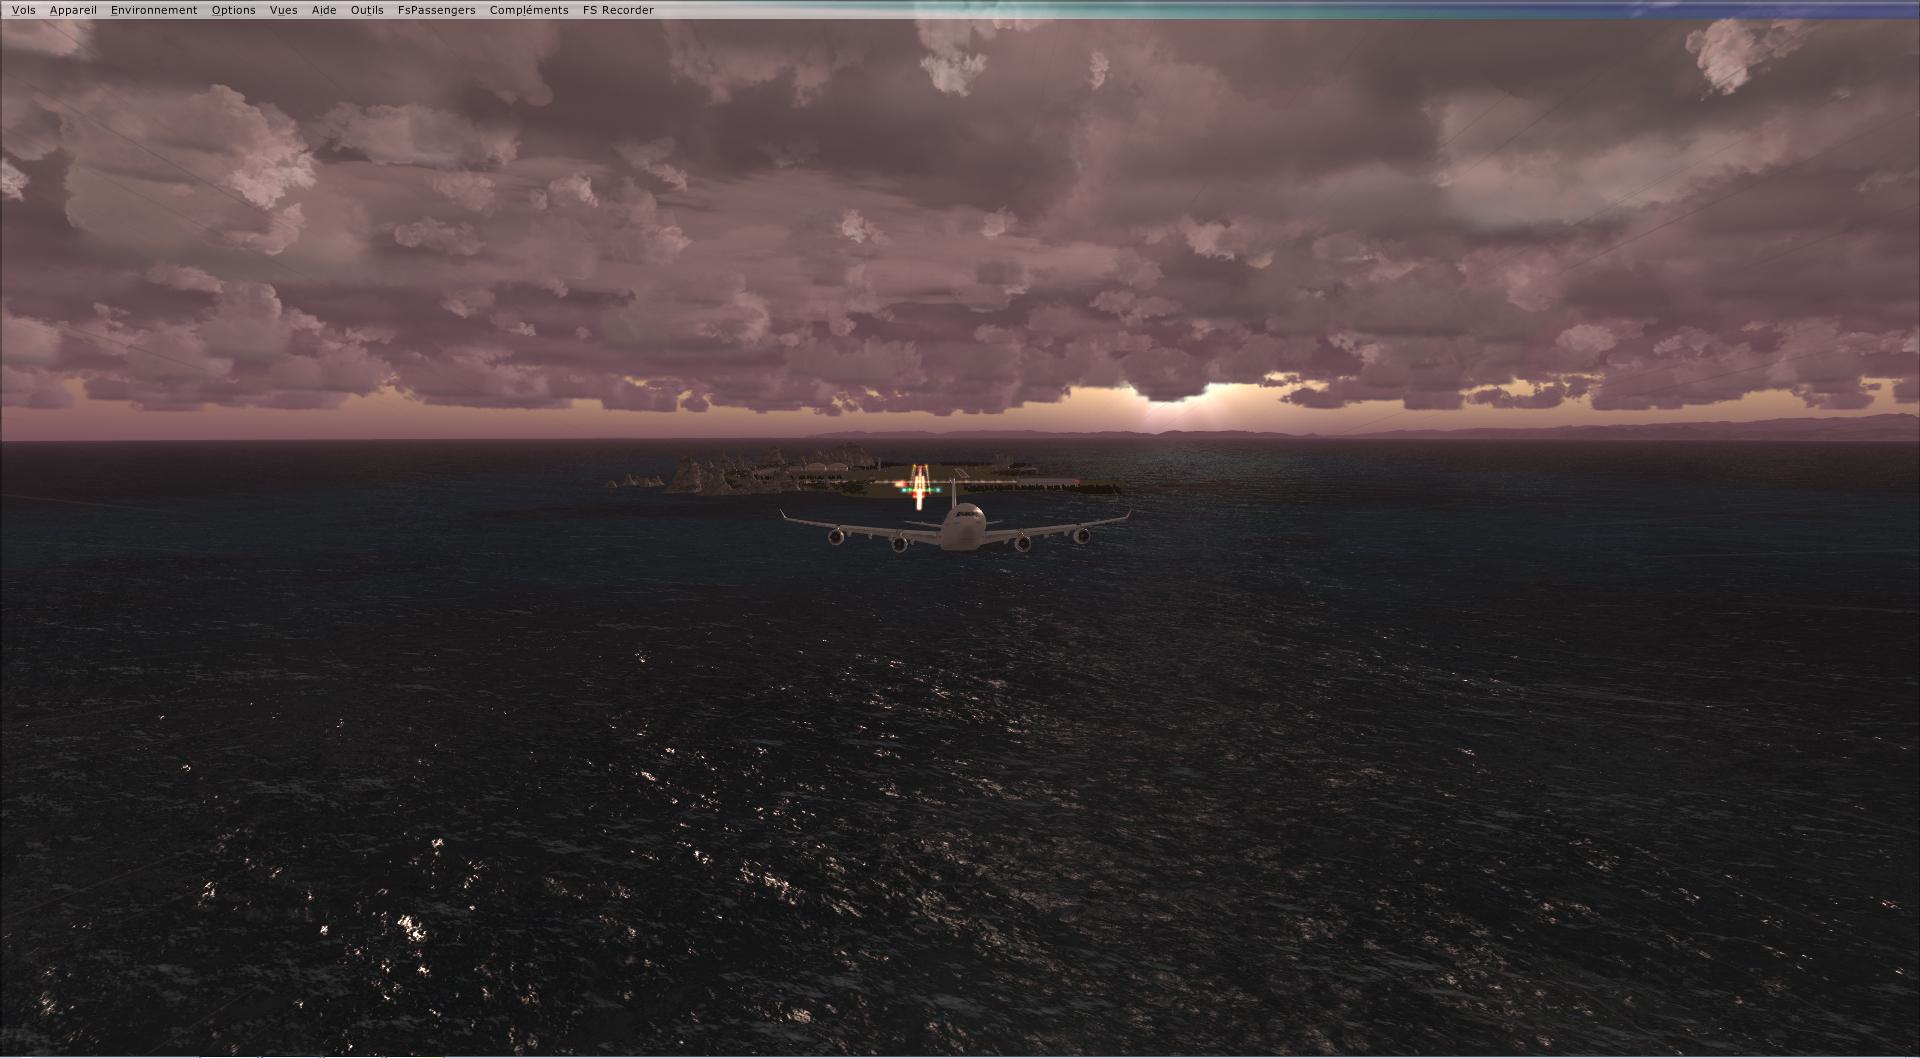 Essai demo X-Plane 10 - Page 2 3869072013426223631432